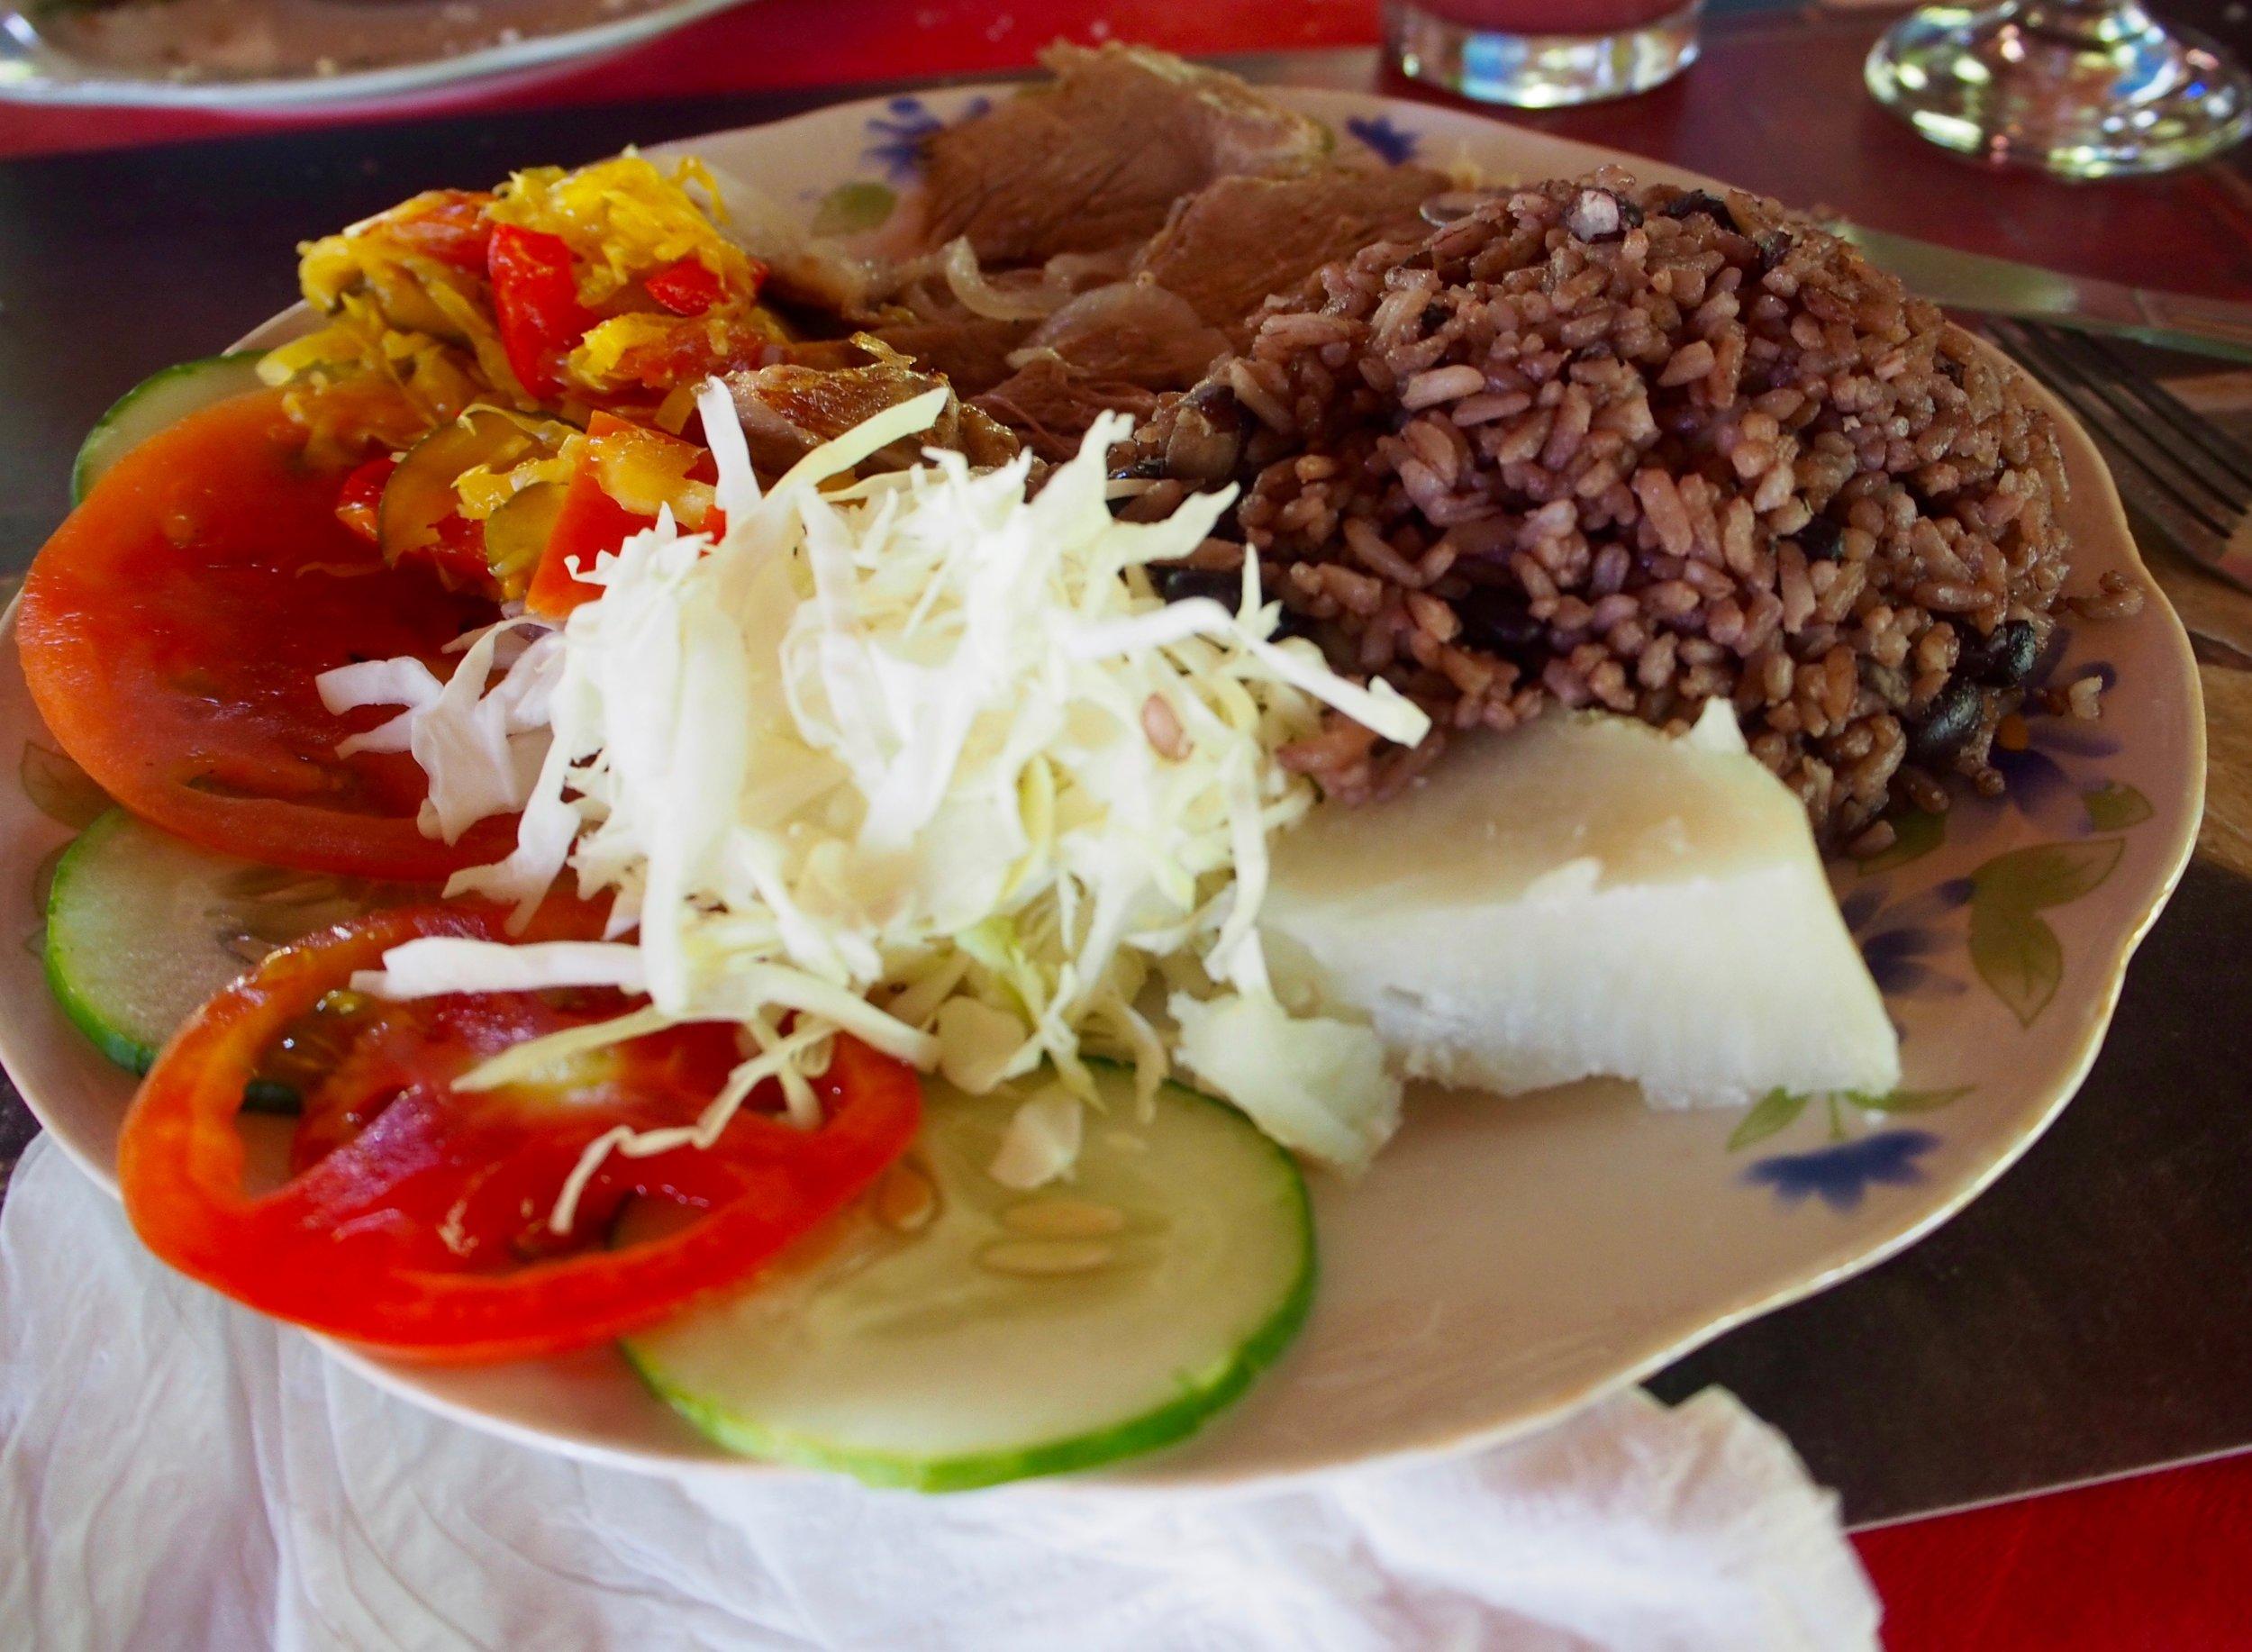 Lunch: pork, vegges, sweet potato and rice & beans